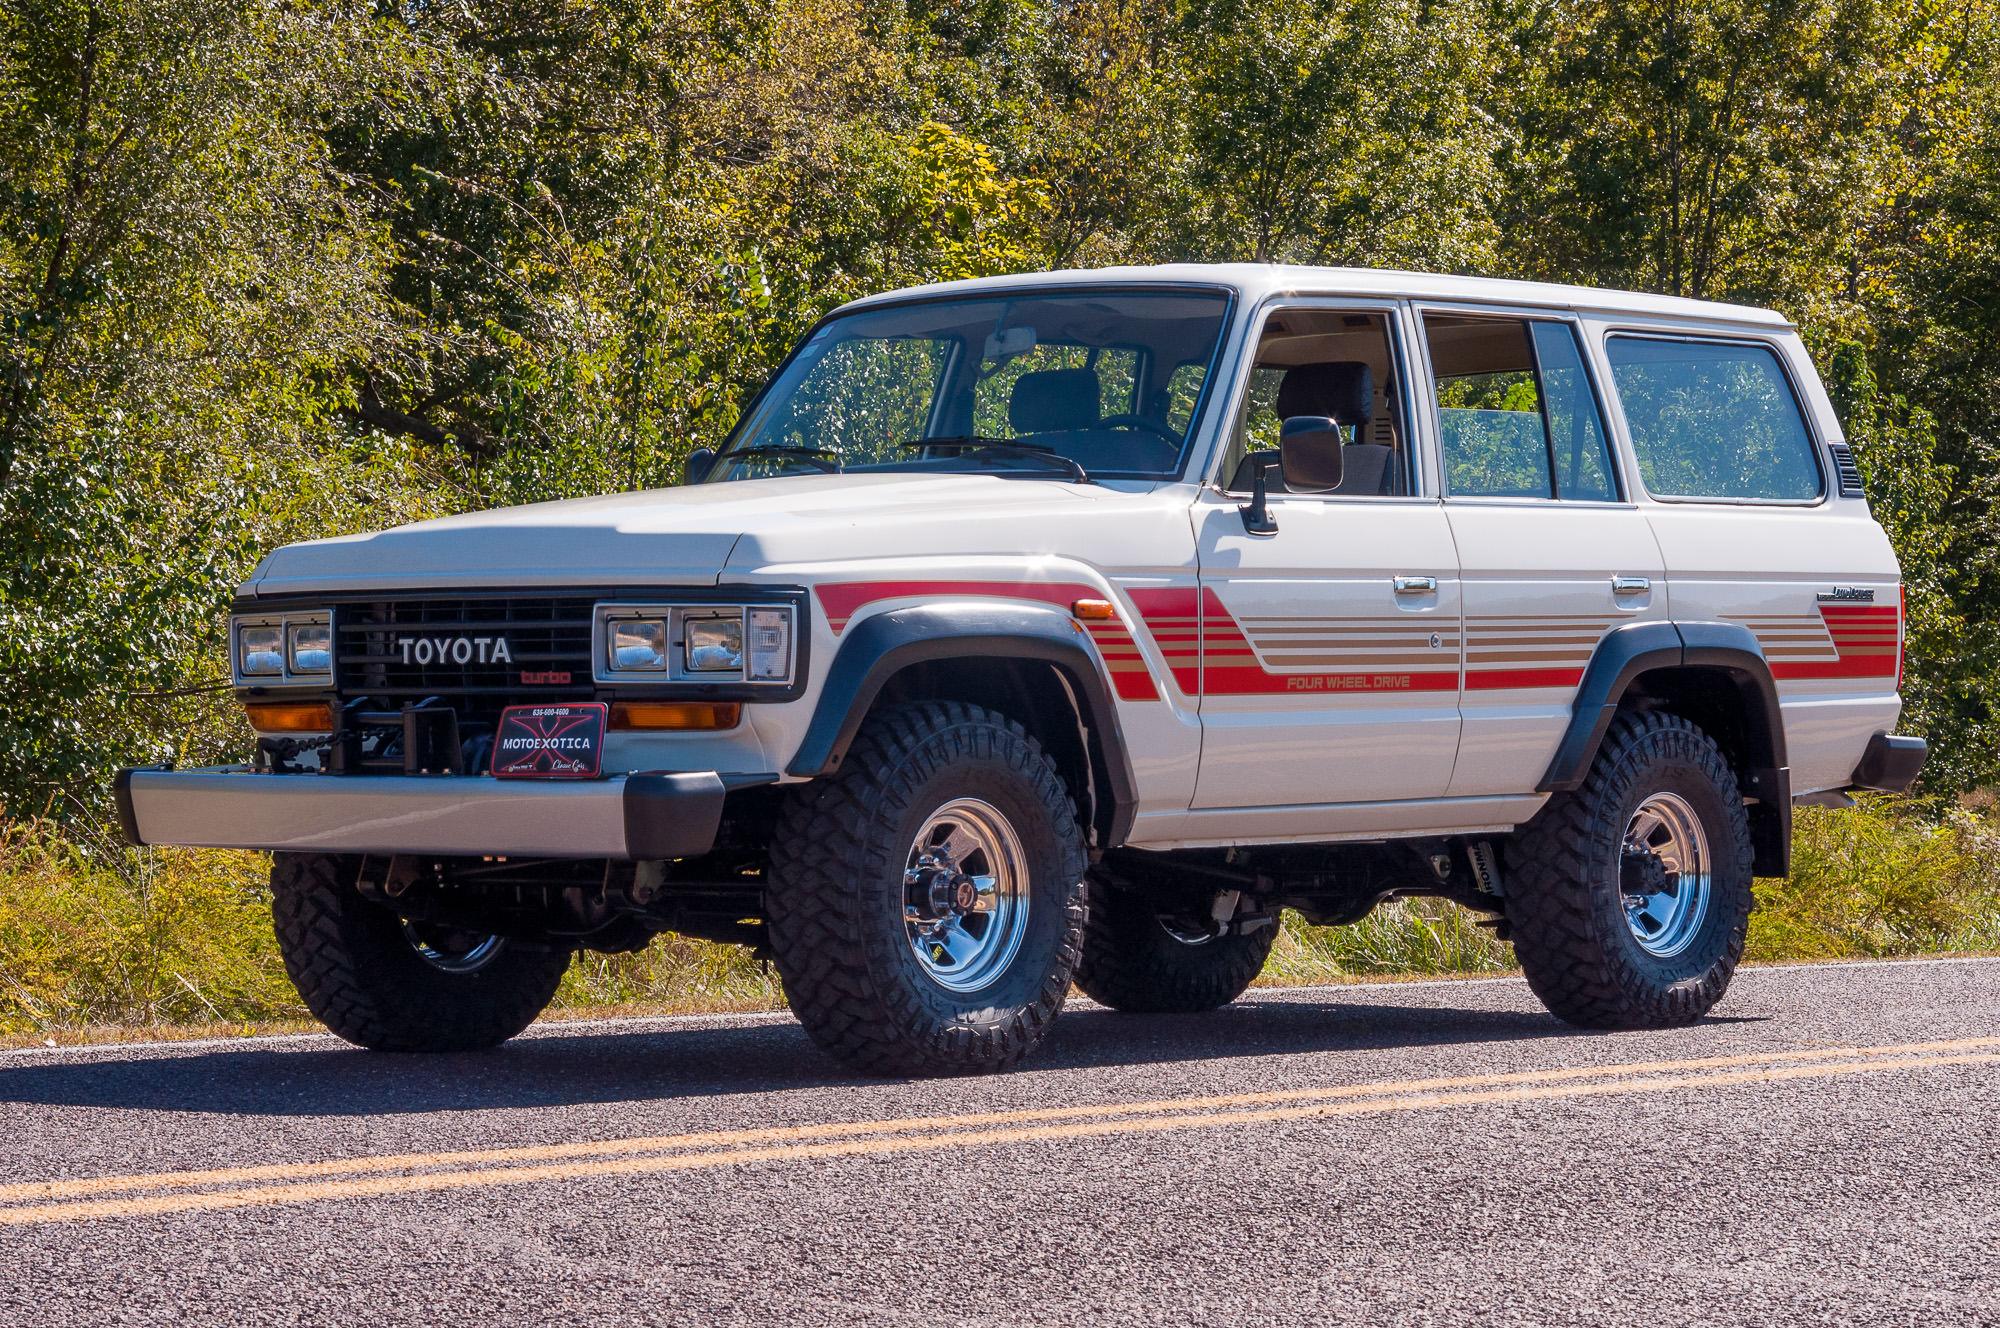 Kelebihan Kekurangan Toyota Land Cruiser 1988 Review